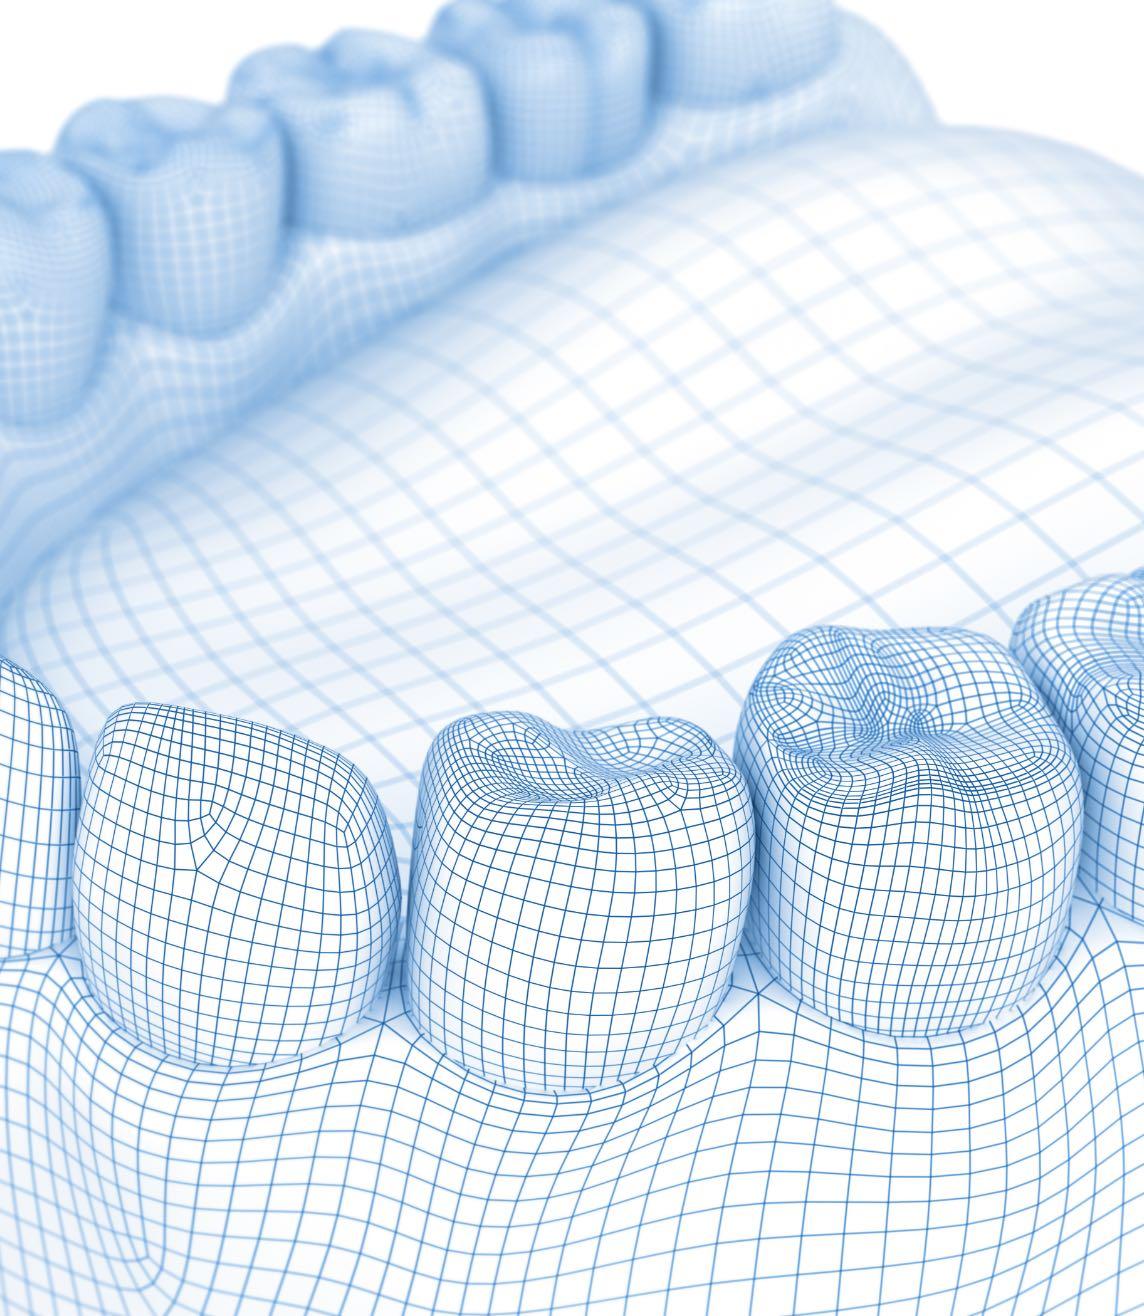 3D teeth graphic